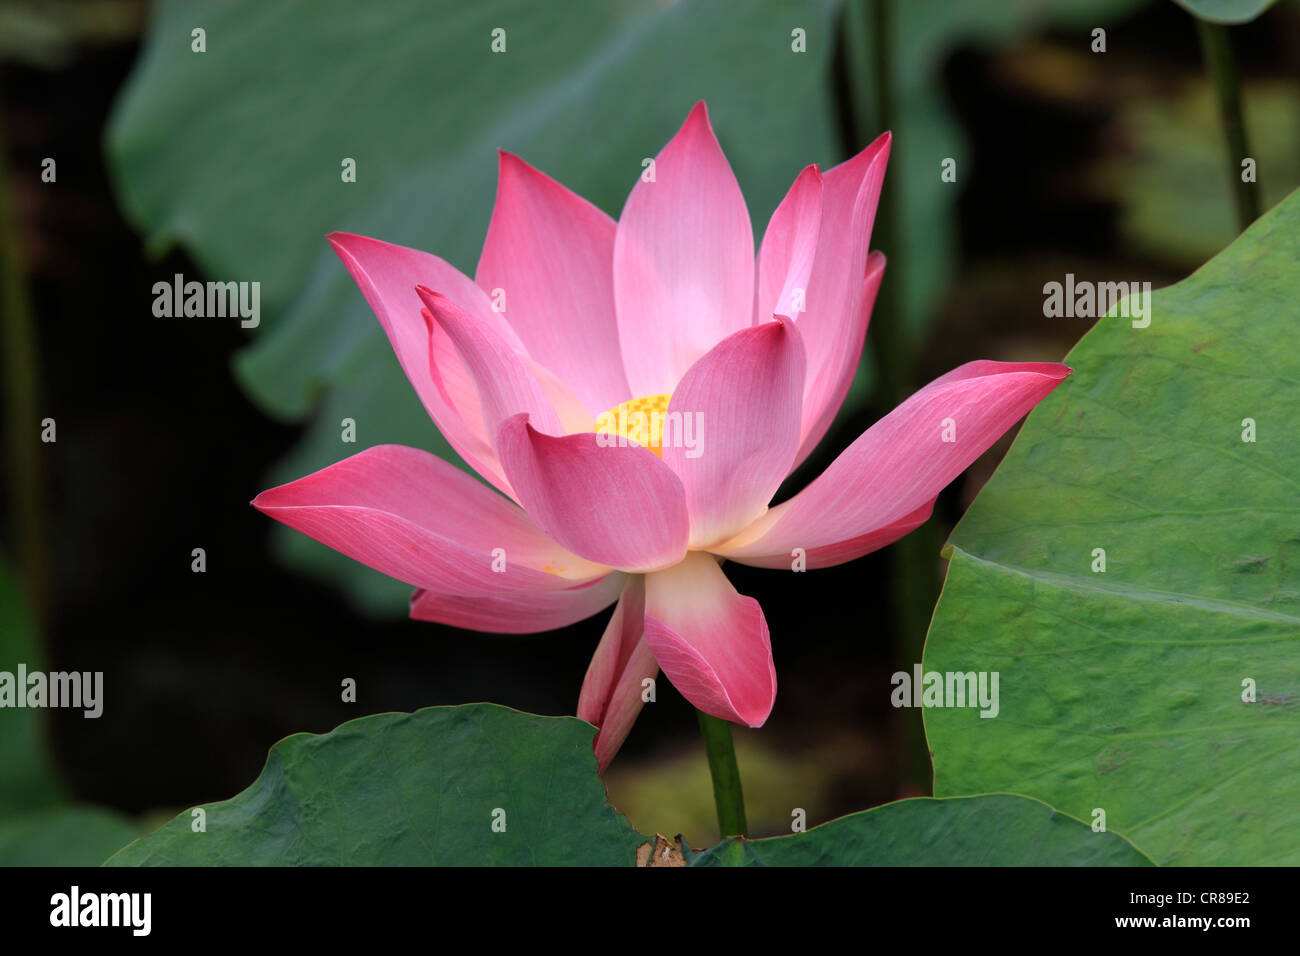 Indian lotus (Nelumbo nucifera), flower, Kota Kinabalu, Sabah, Malaysia, Borneo, Southeast Asia - Stock Image